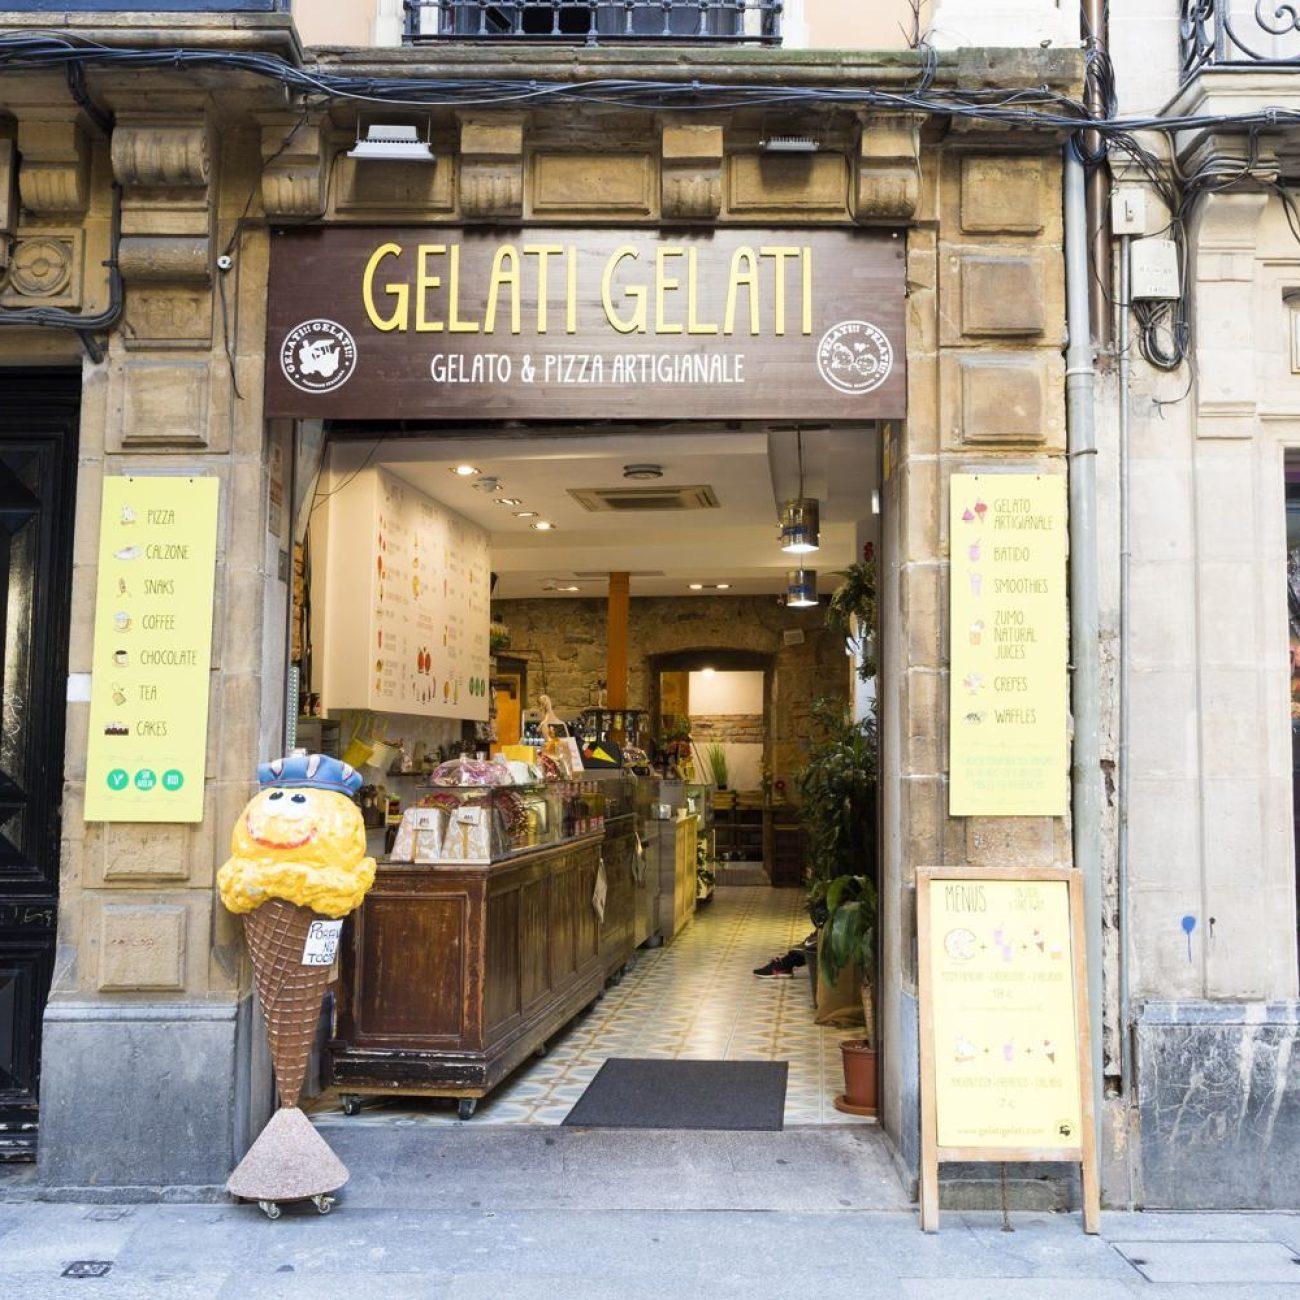 5781 gelati-gelati 01